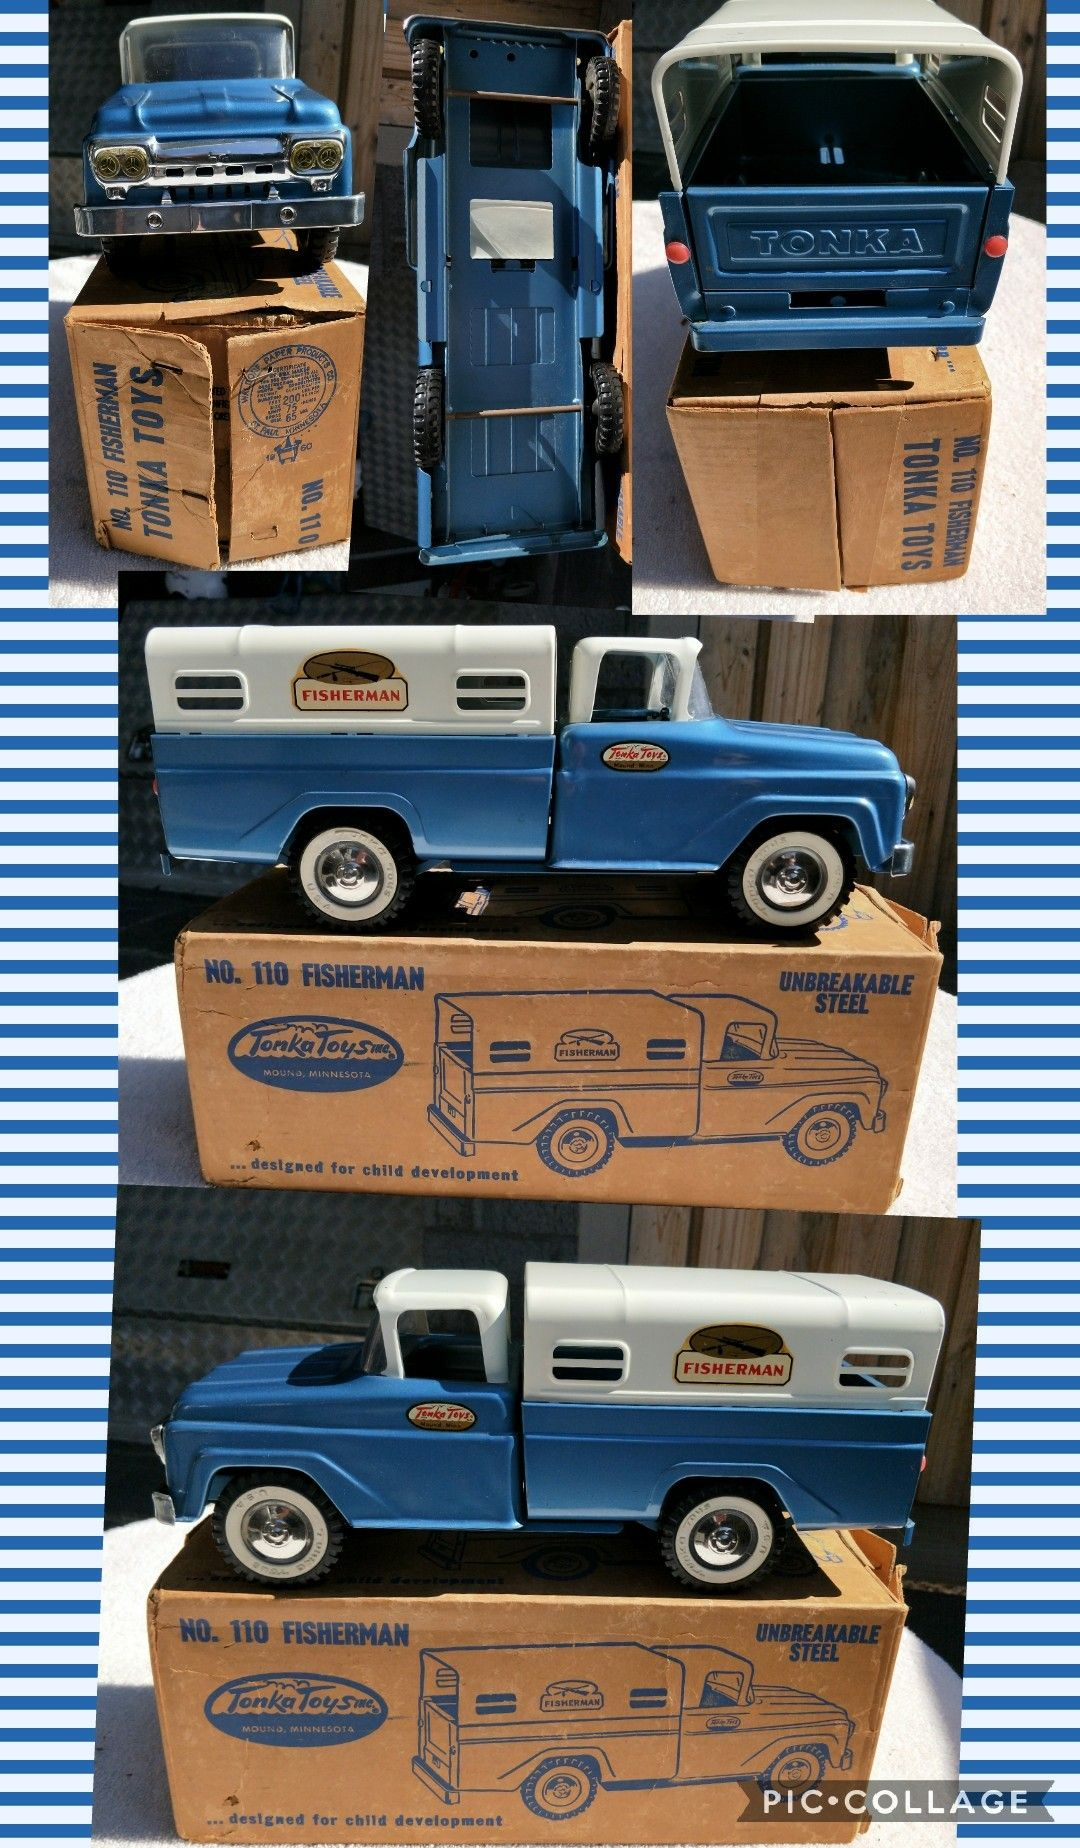 1960 toys images  Mint Original TONKA  FISHERMAN TRUCK  WITH BOX  toy trucks